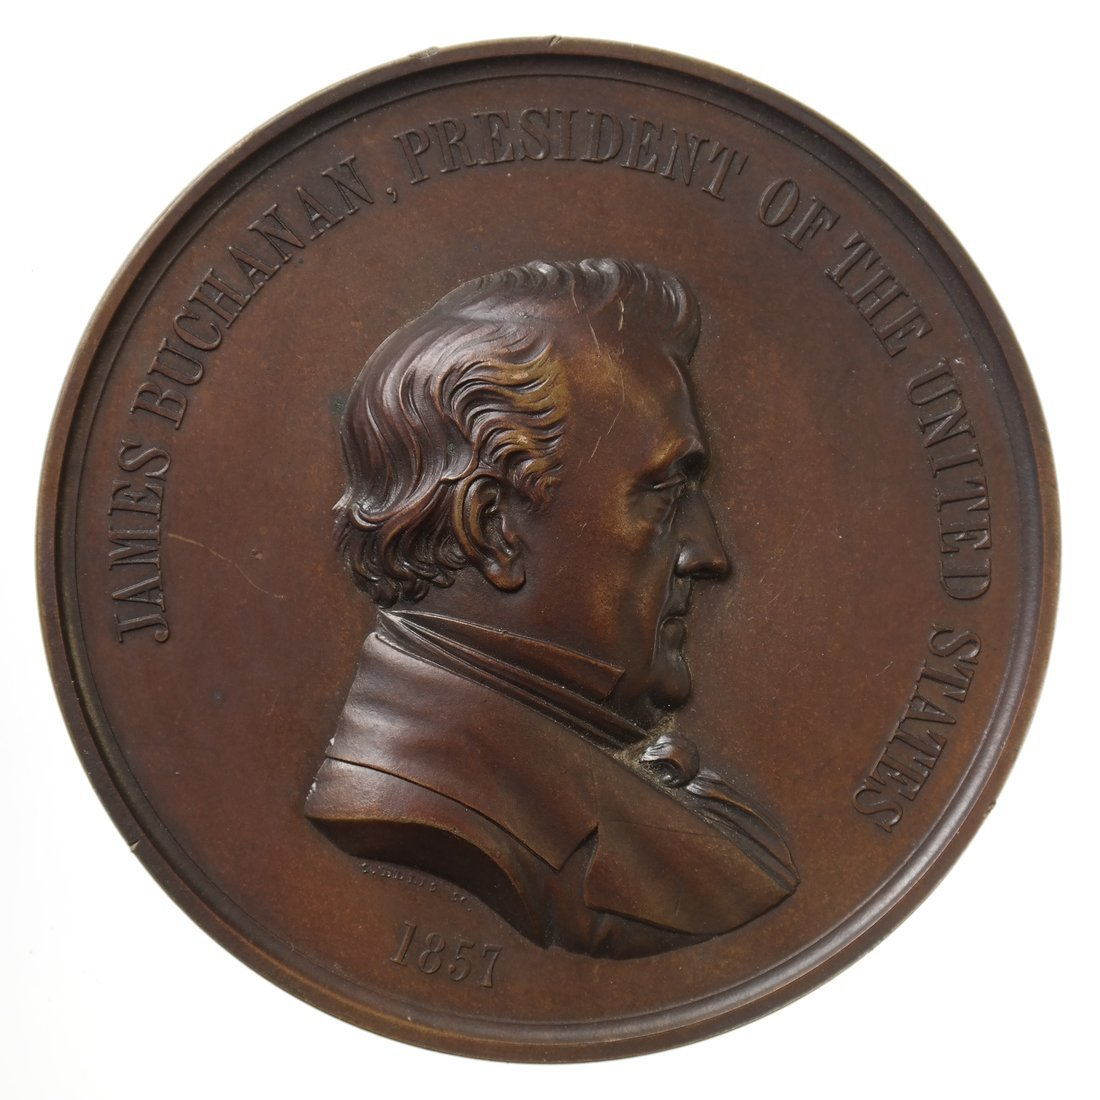 James Buchanan Indian Peace Medal, 1857.